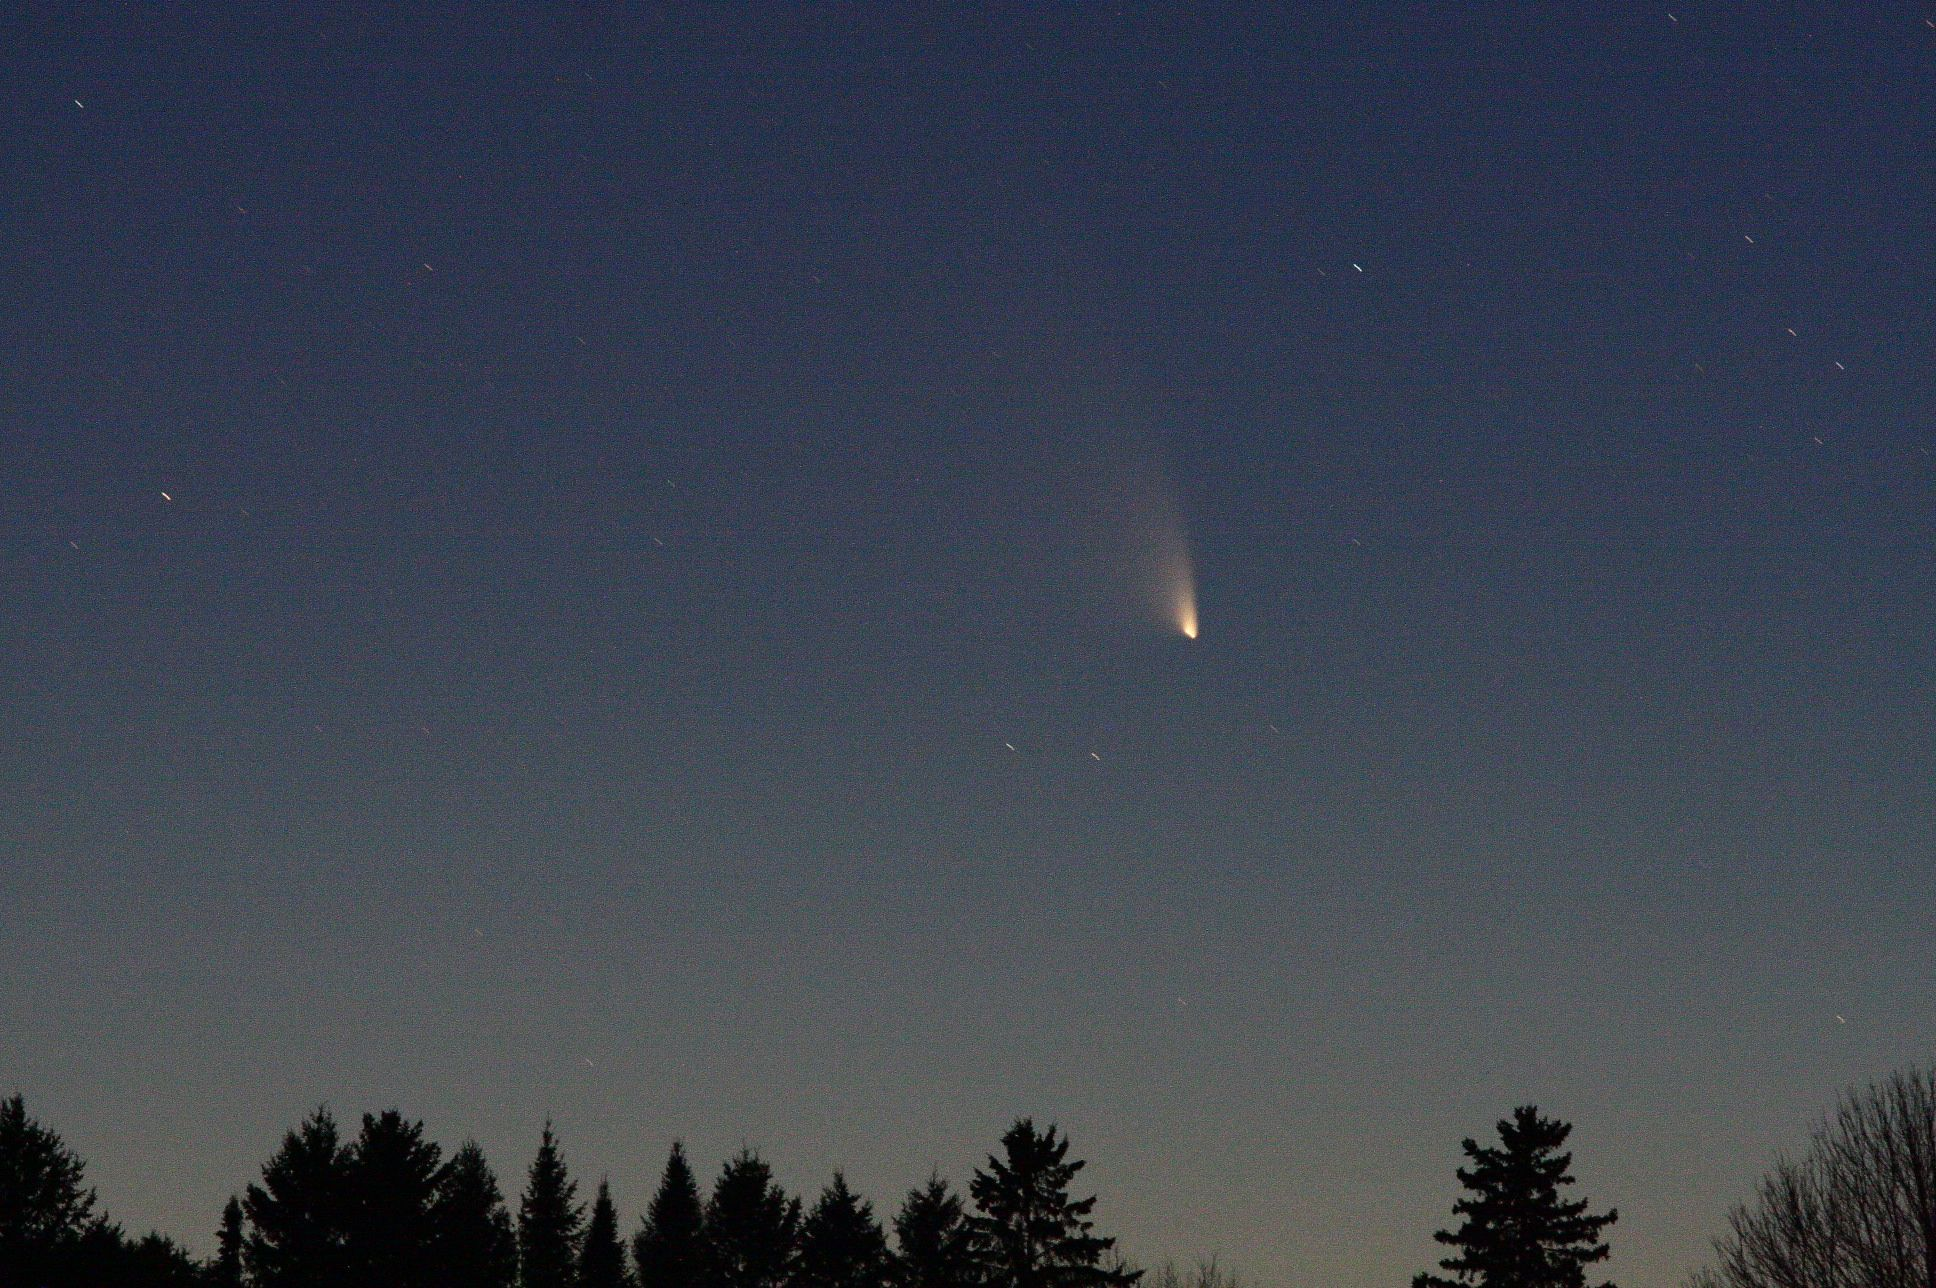 Comet PANSTARSS copy.jpg